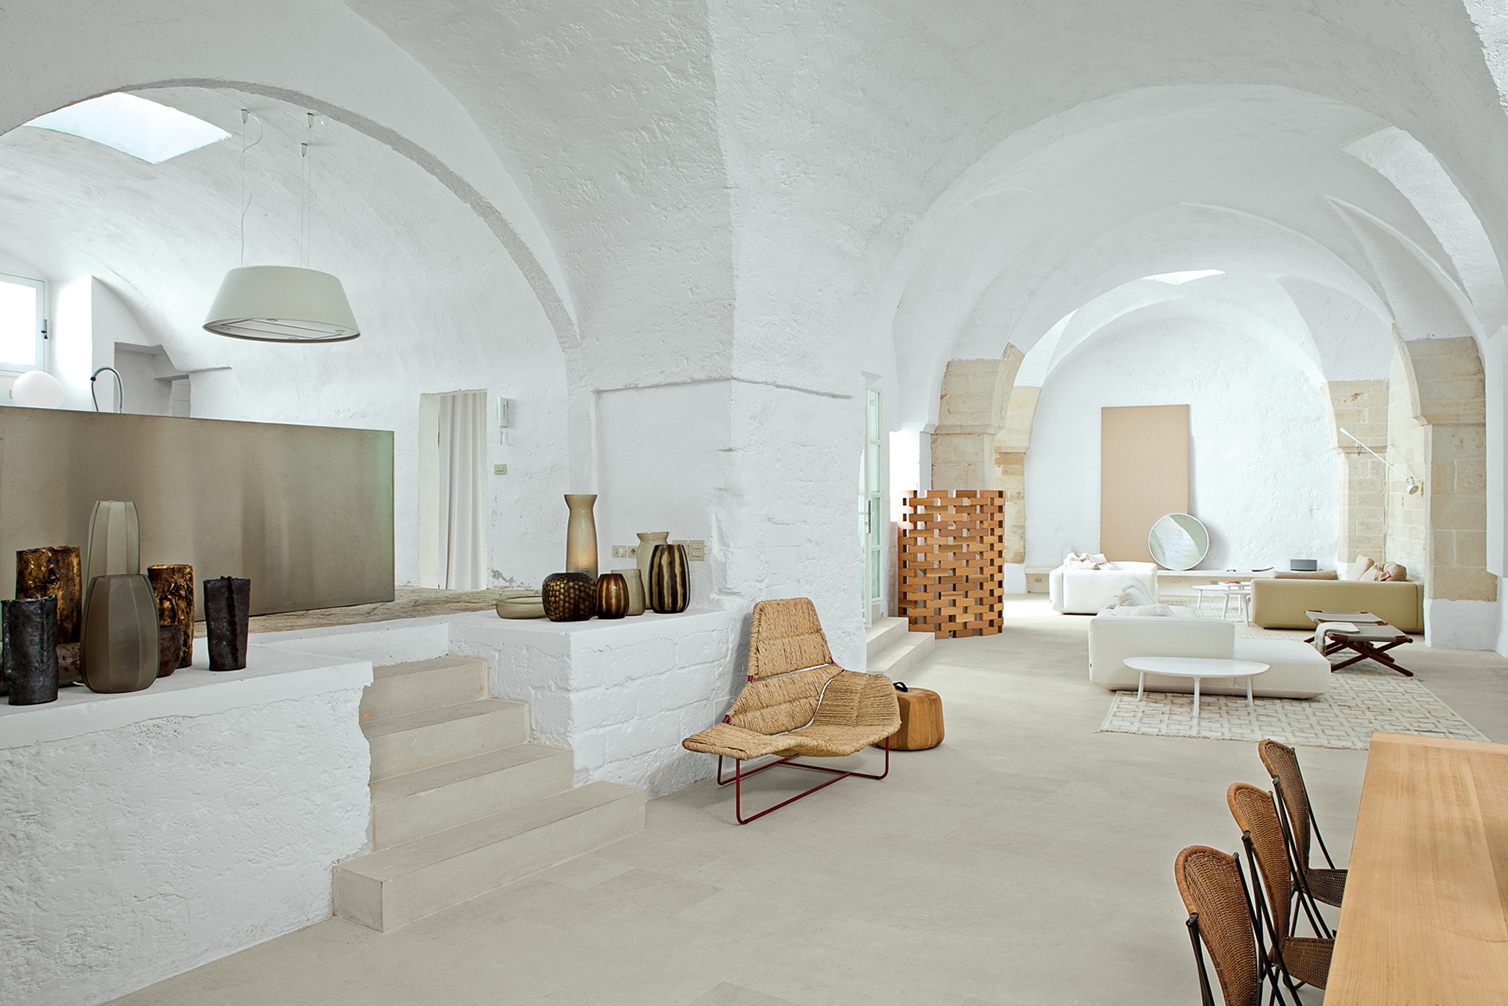 Designer home ludovica roberto palomba vacation house in for Piani di house designer casa